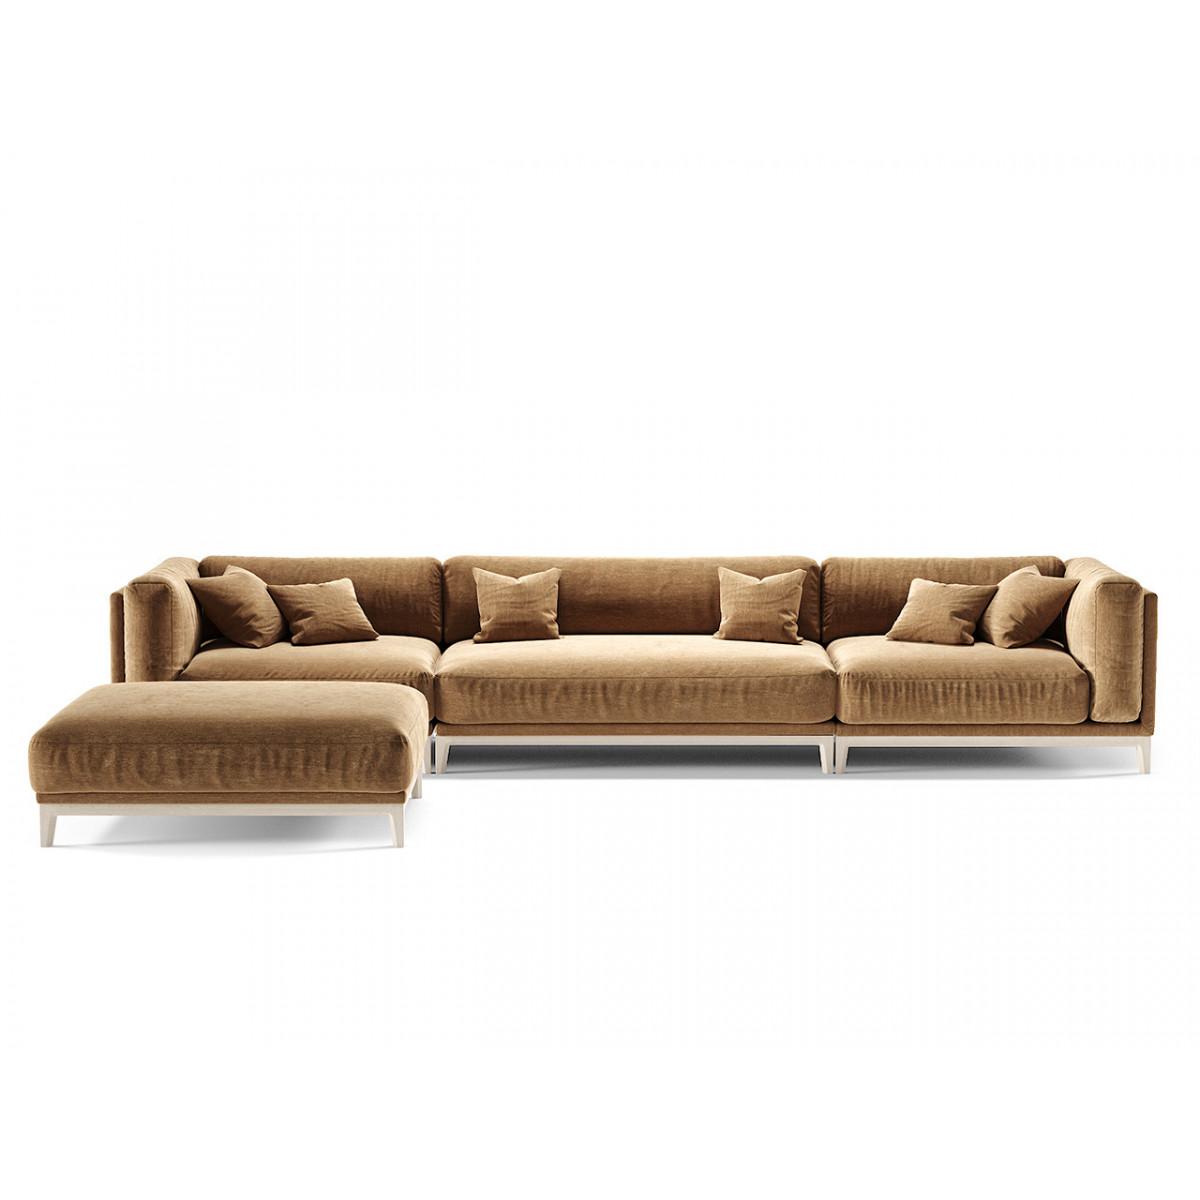 The idea диван case коричневый 122293/9